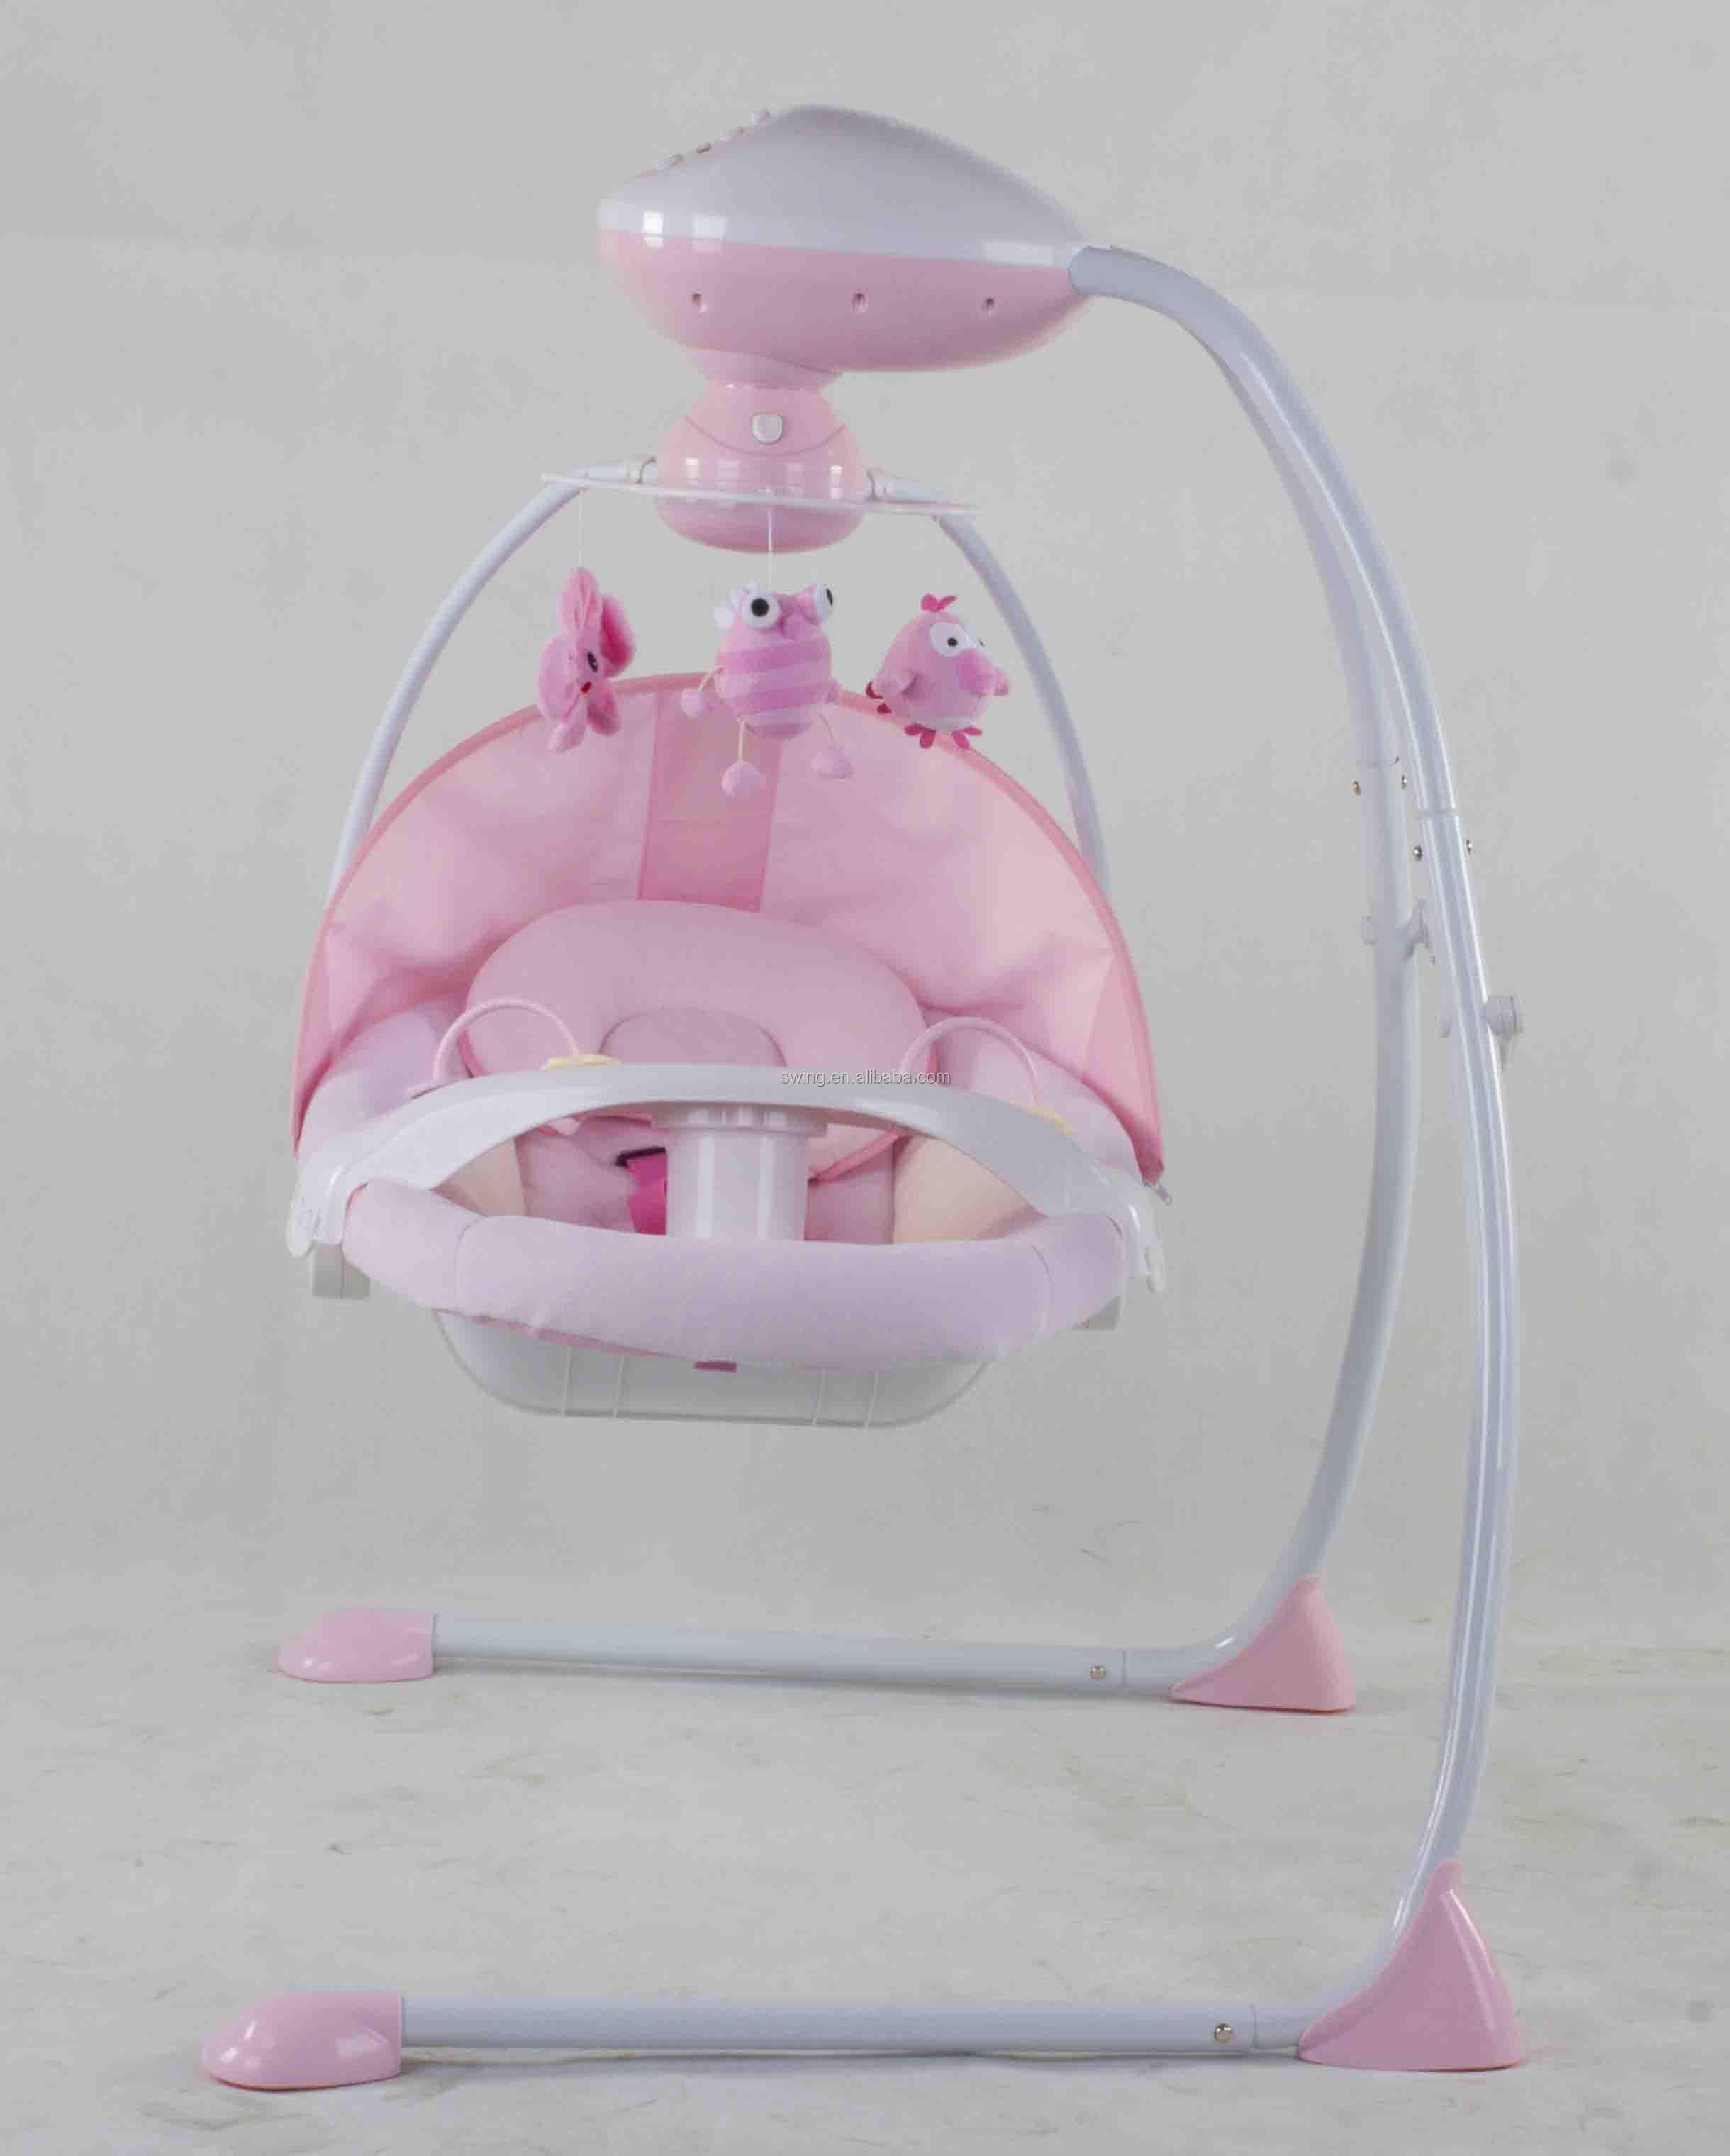 indoor schaukel elektrische babybett baby schaukel elektrischen elektronischen swing mit. Black Bedroom Furniture Sets. Home Design Ideas